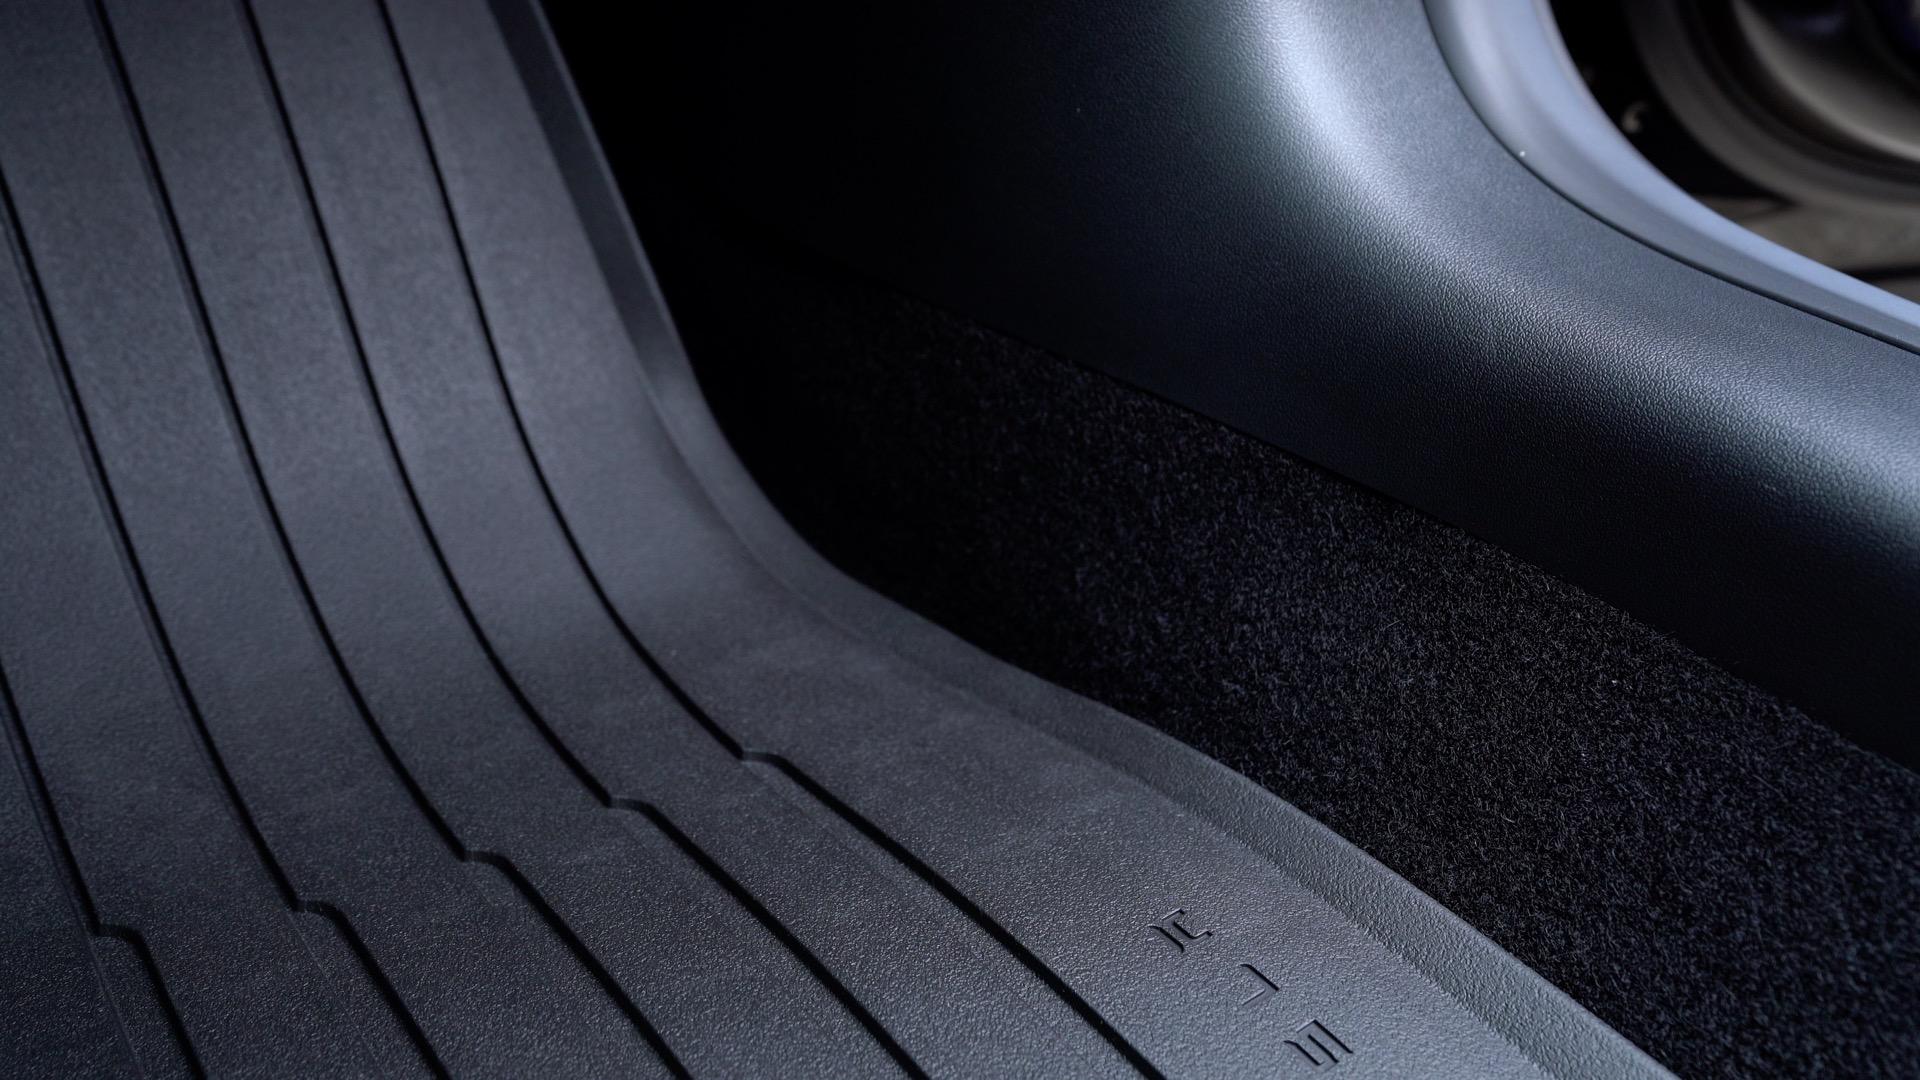 hands-on for winter  installing official tesla model 3 all-weather floor mats  video